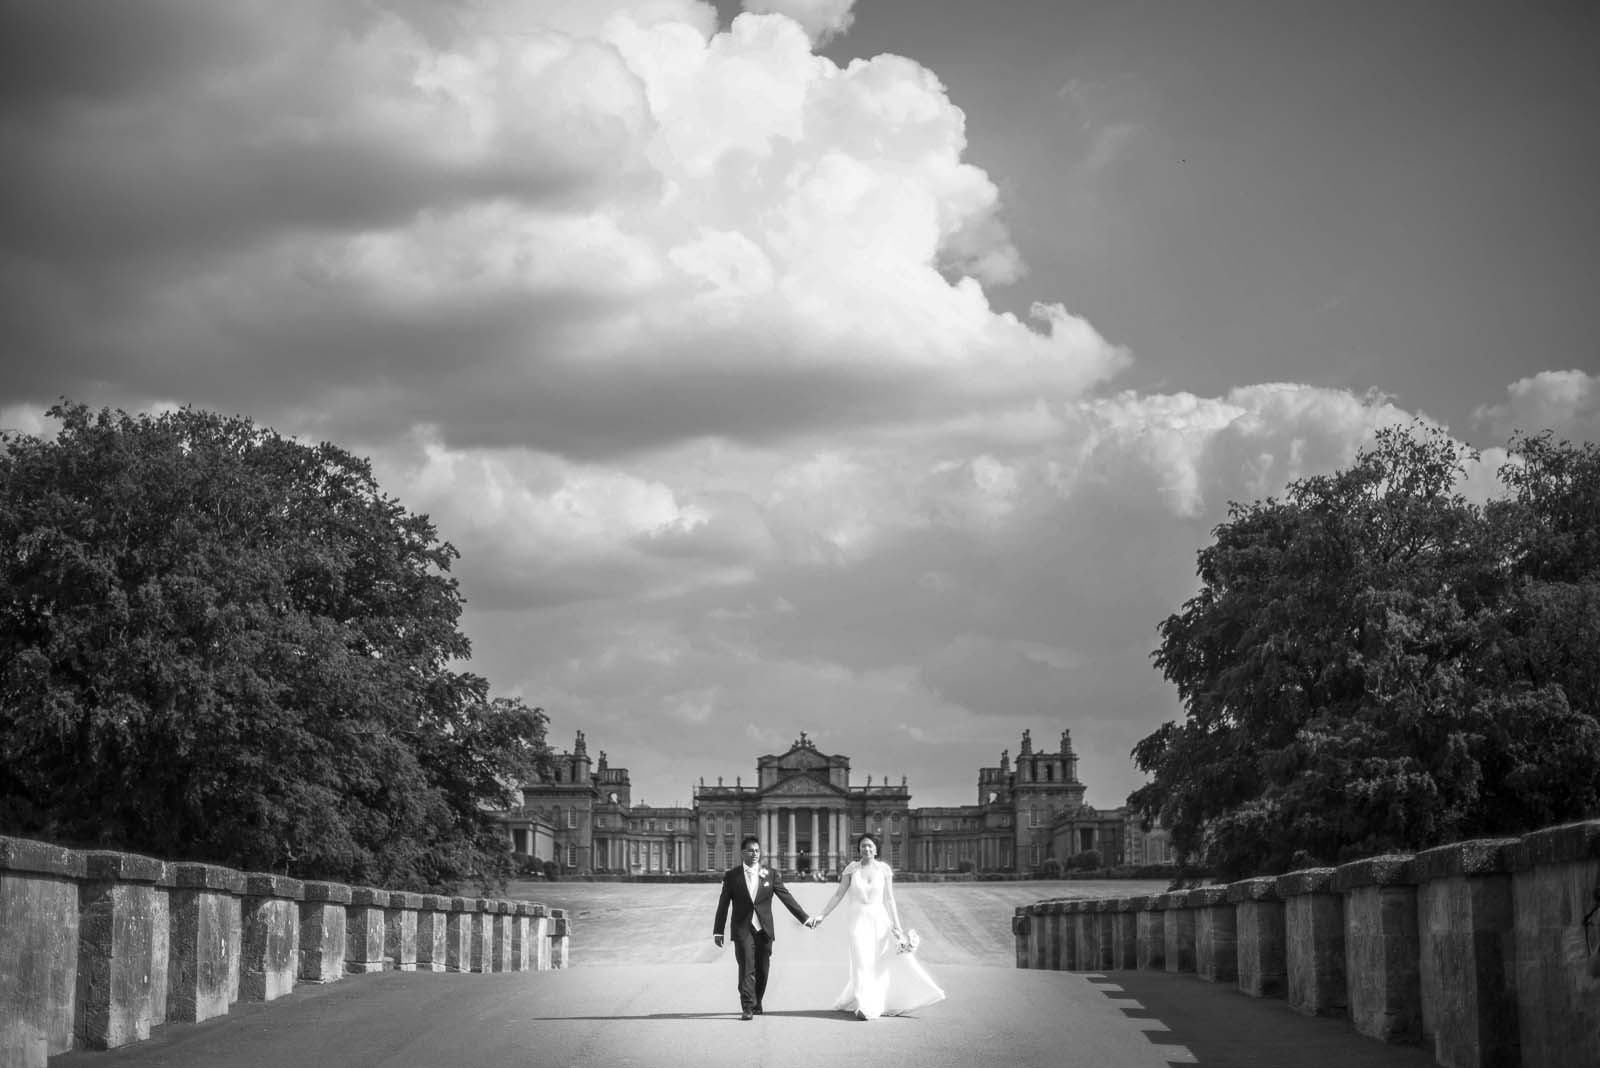 Blenheim Palace Wedding Photographer based in London - Steph and Akash